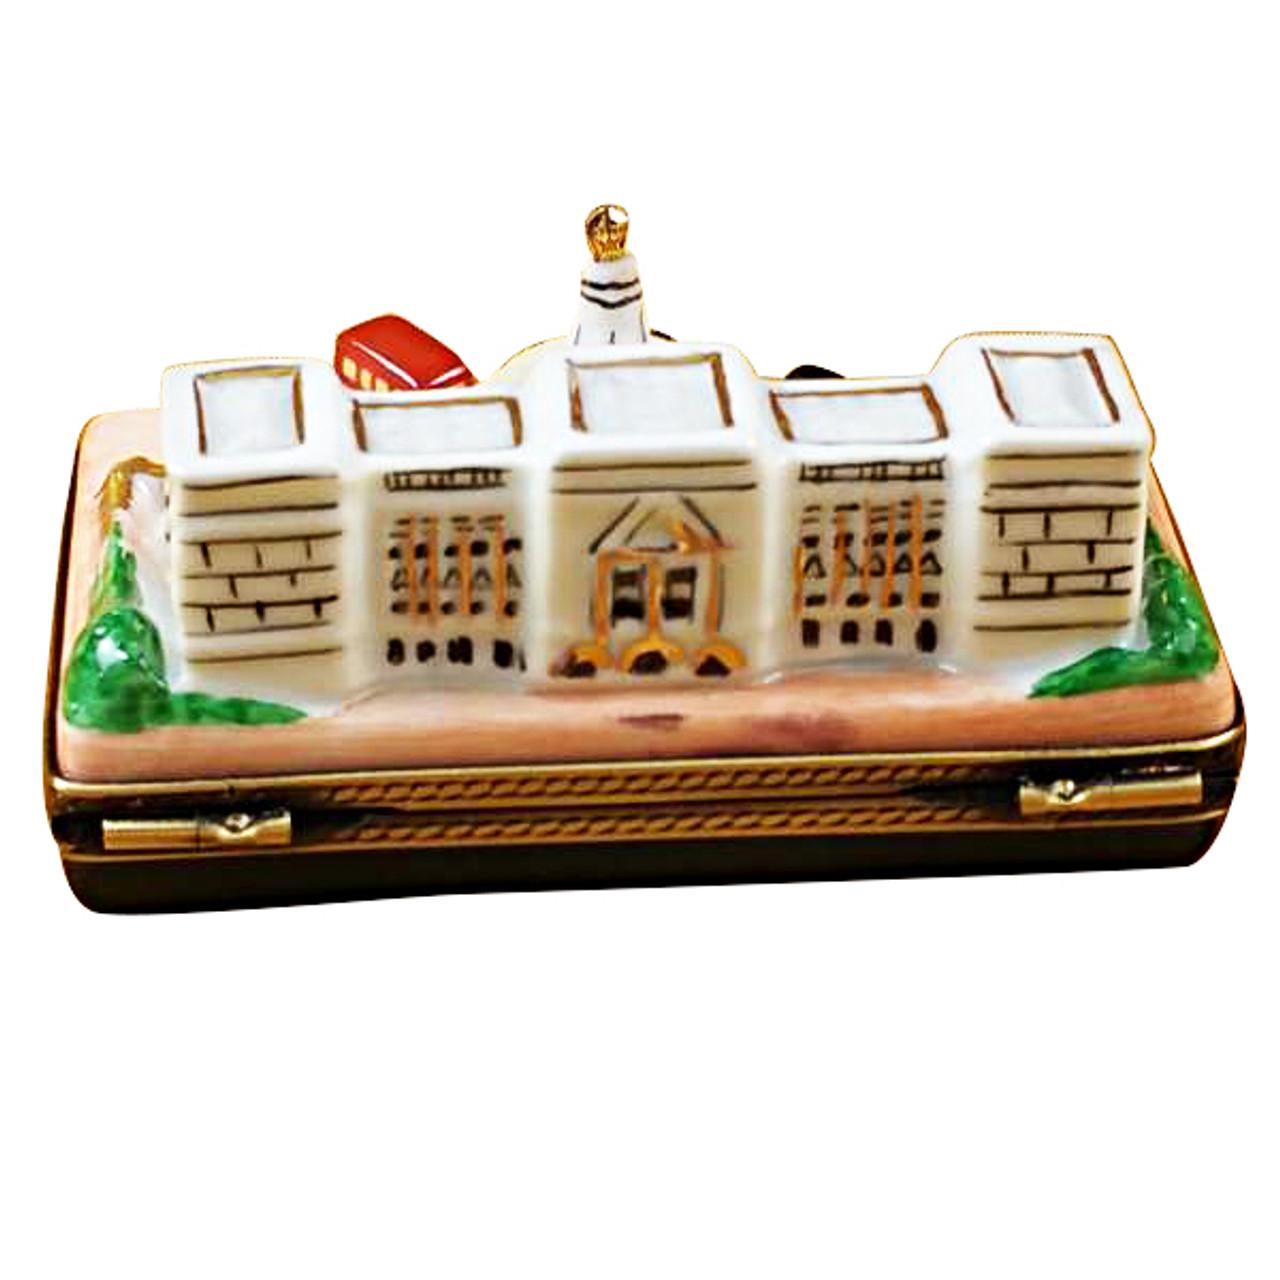 Buckingham Palace Rochard Limoges Box